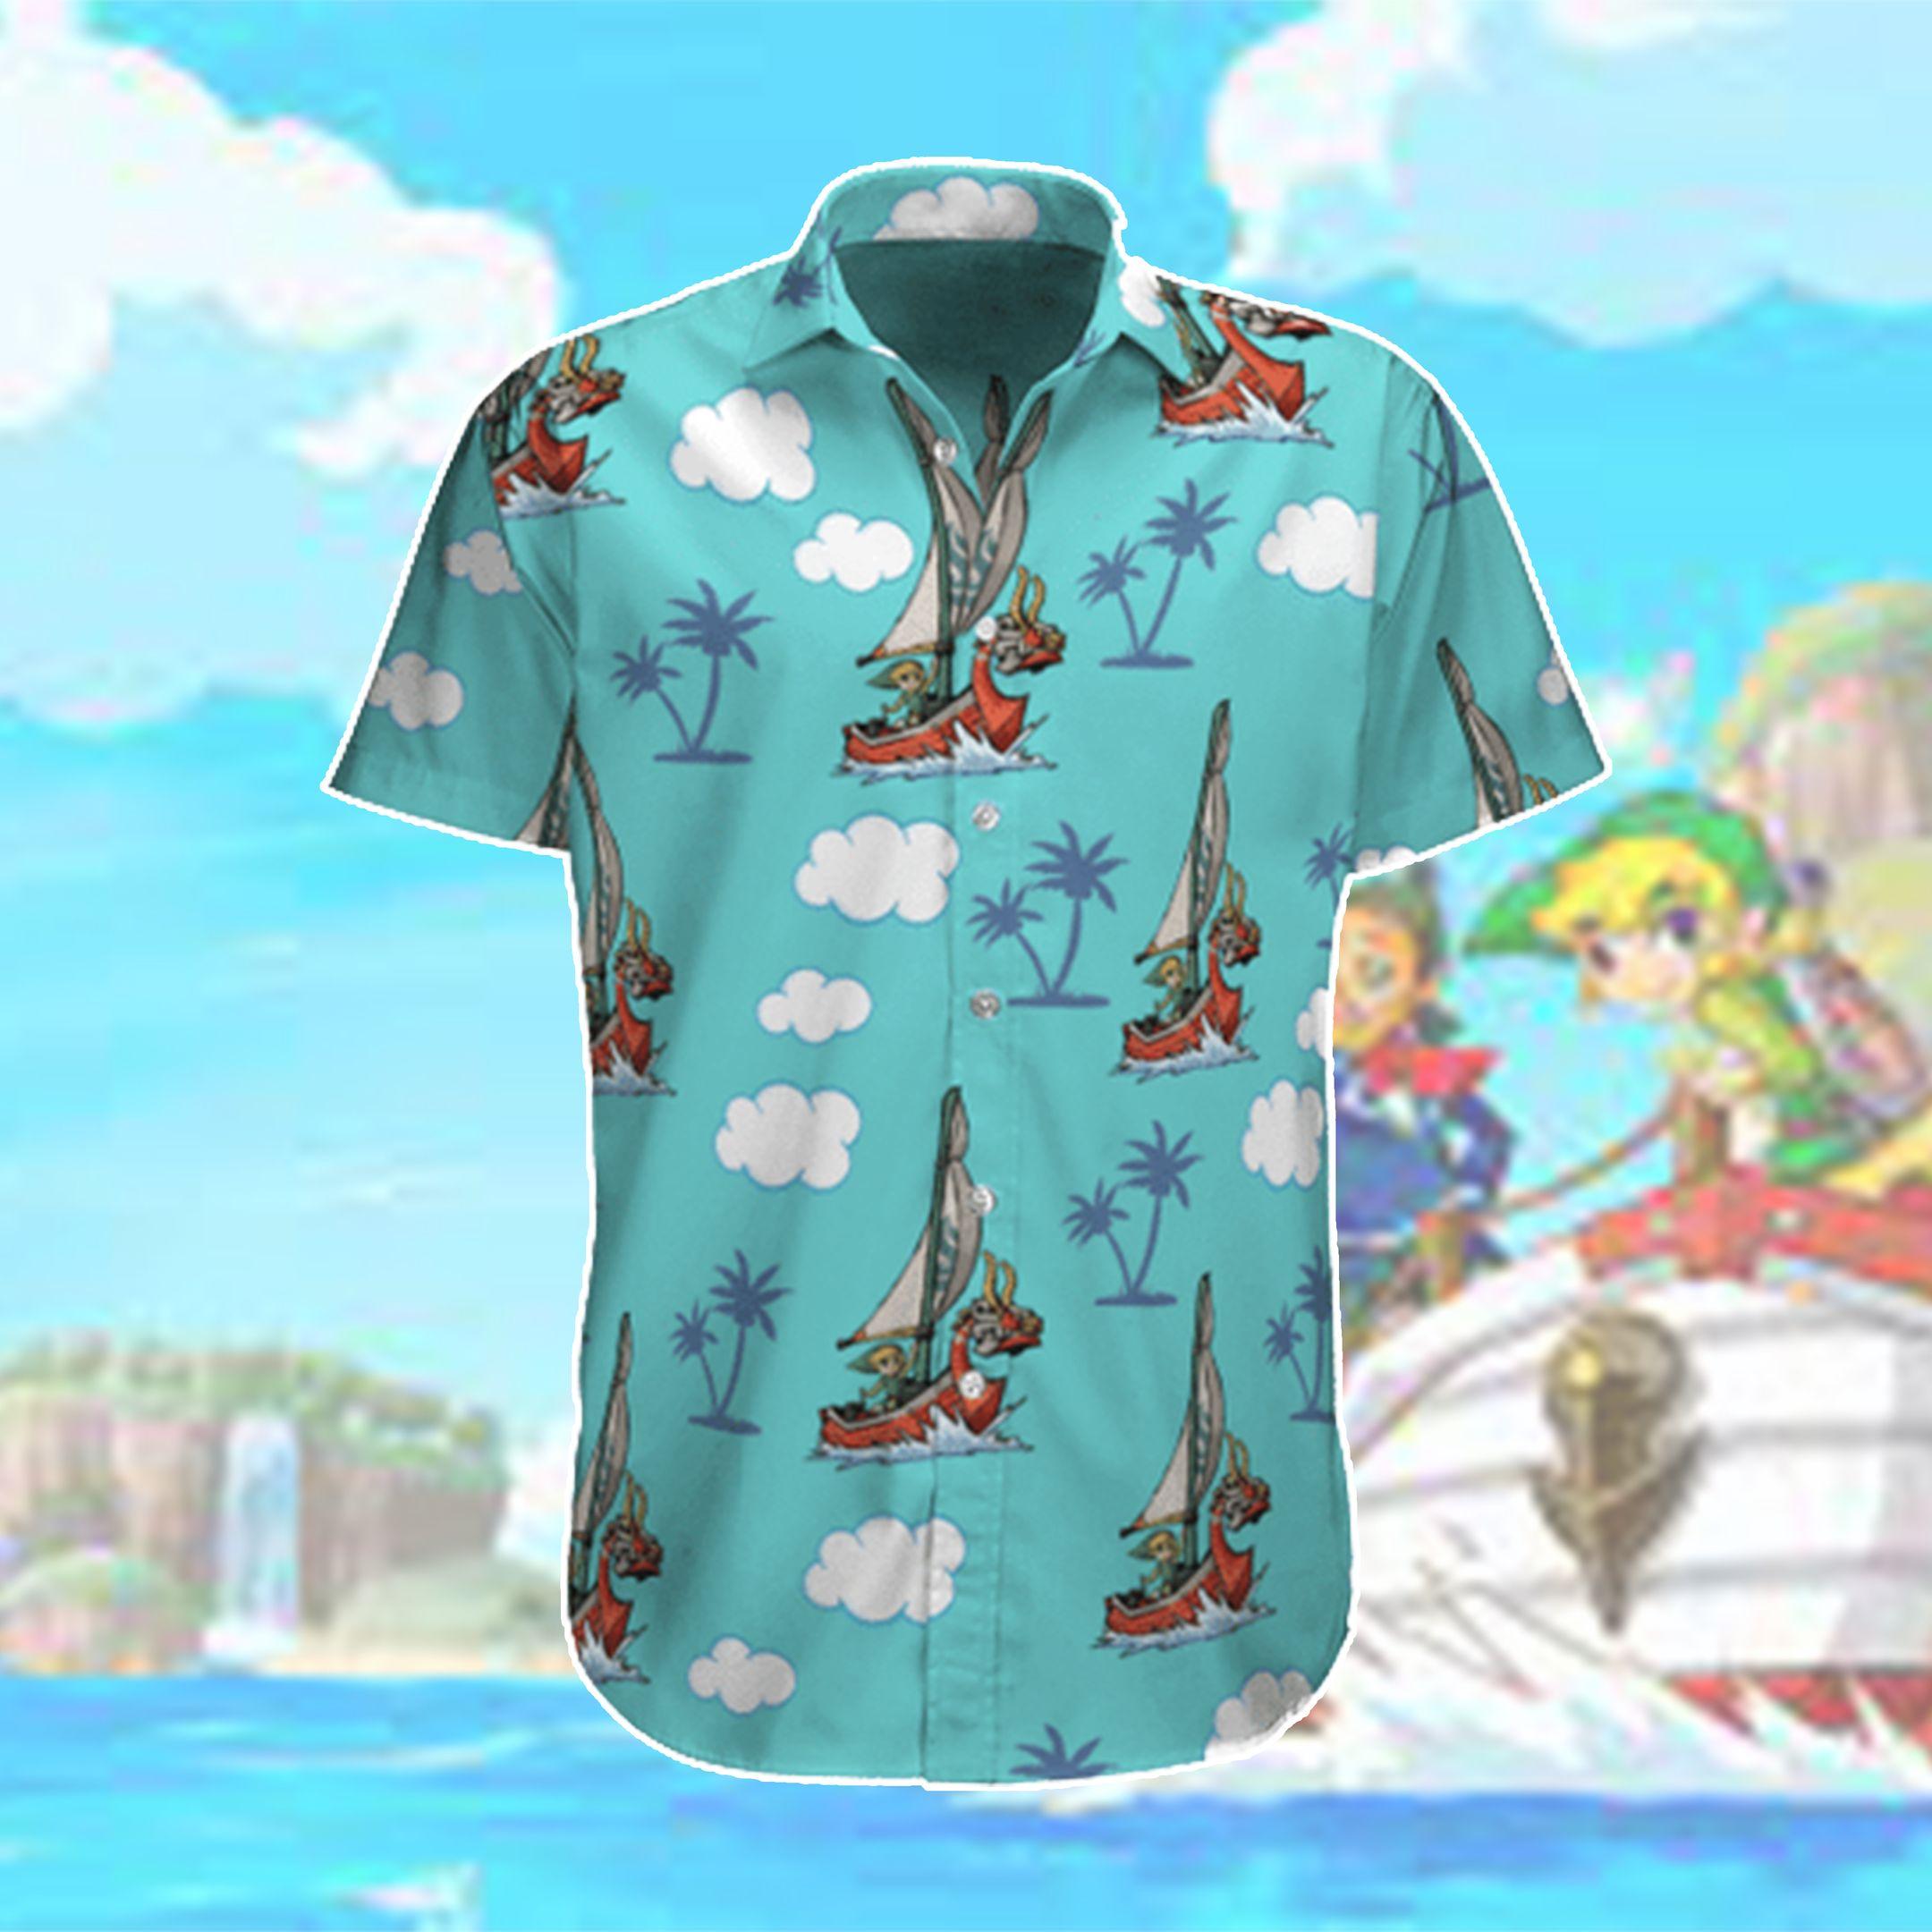 Legend of Zelda The Wind Waker Hawaiian Shirt and Beach Shorts